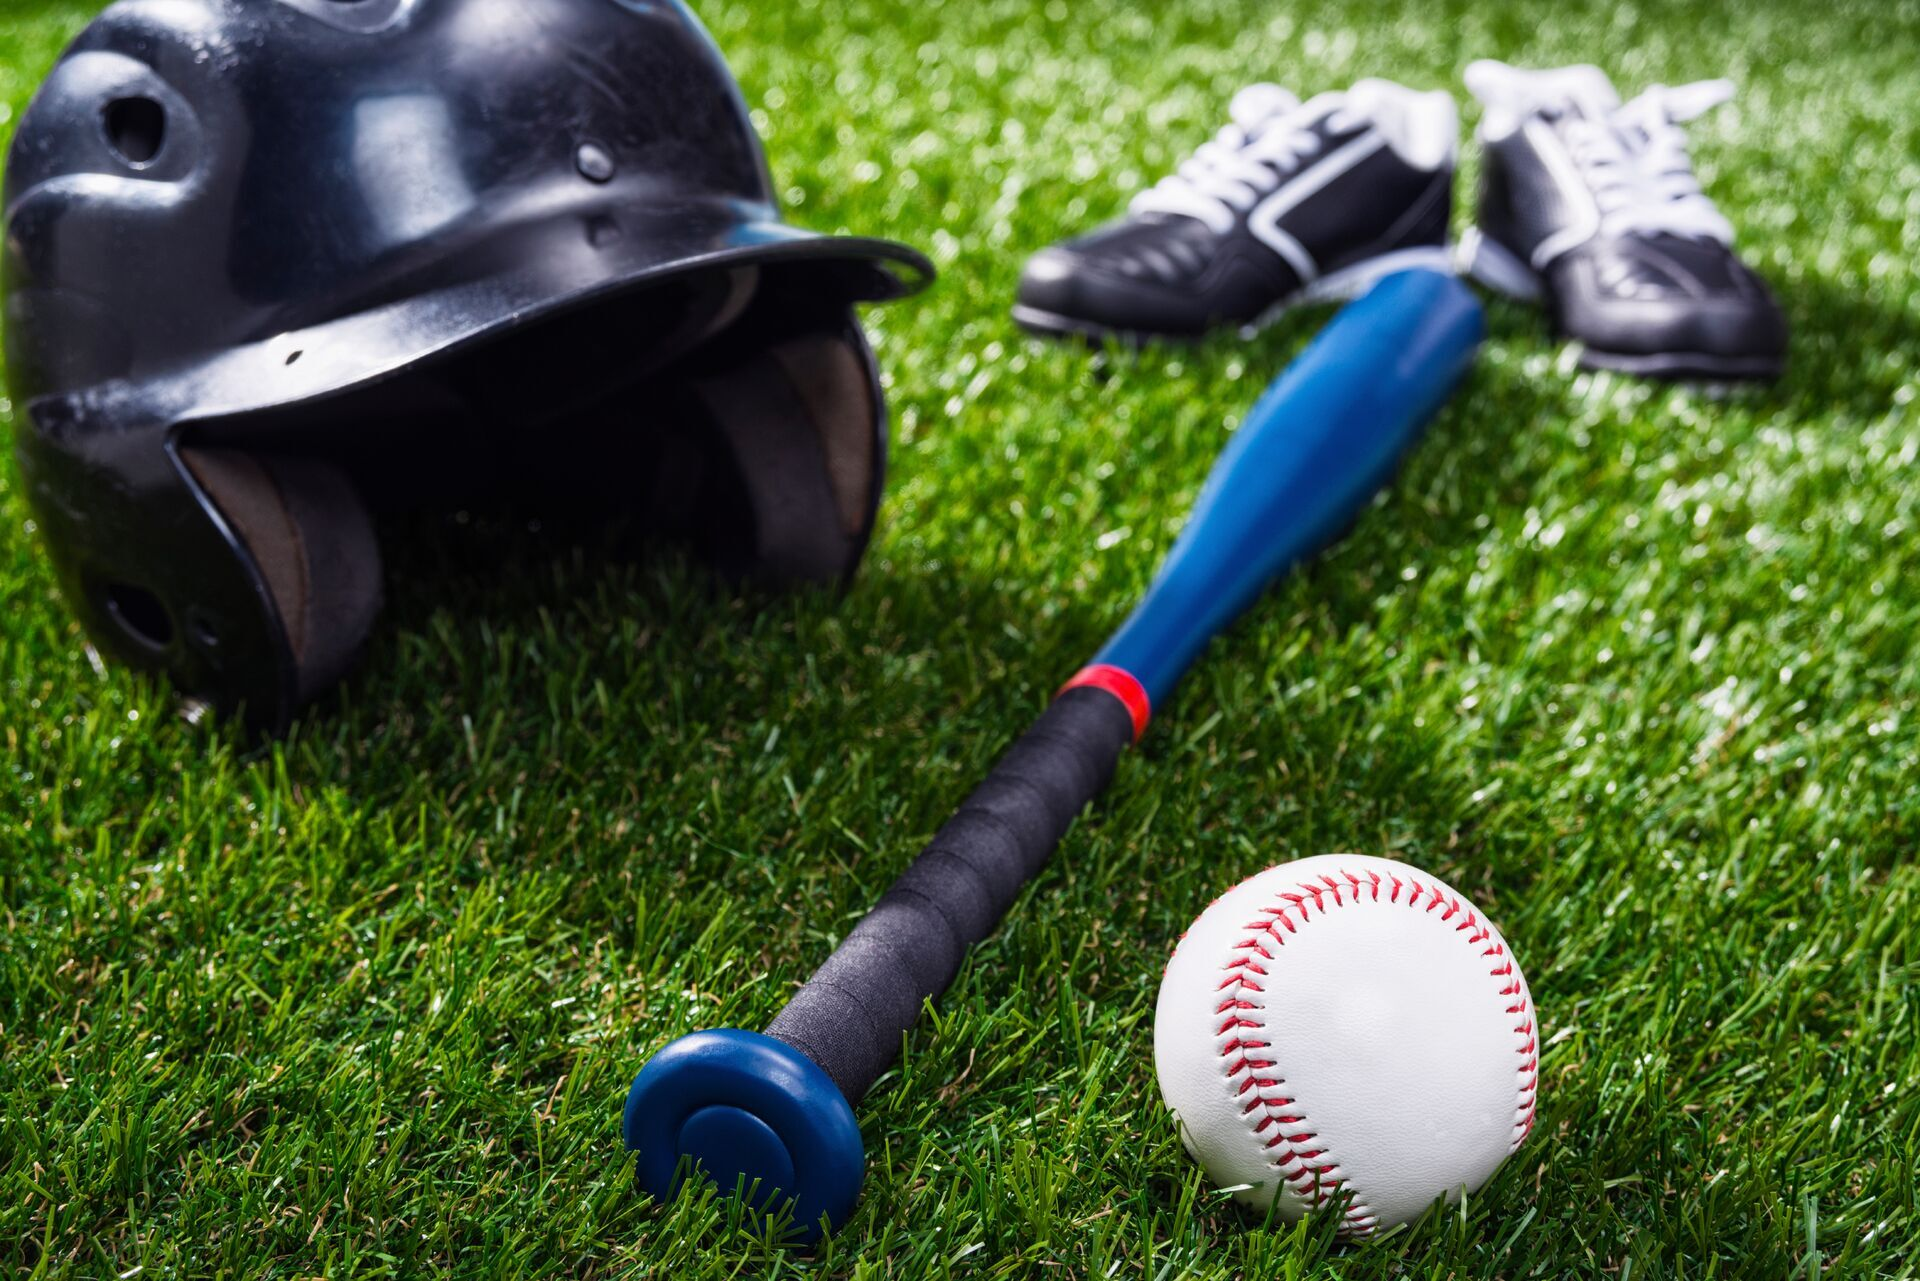 Baseball kit for kids placed on grass